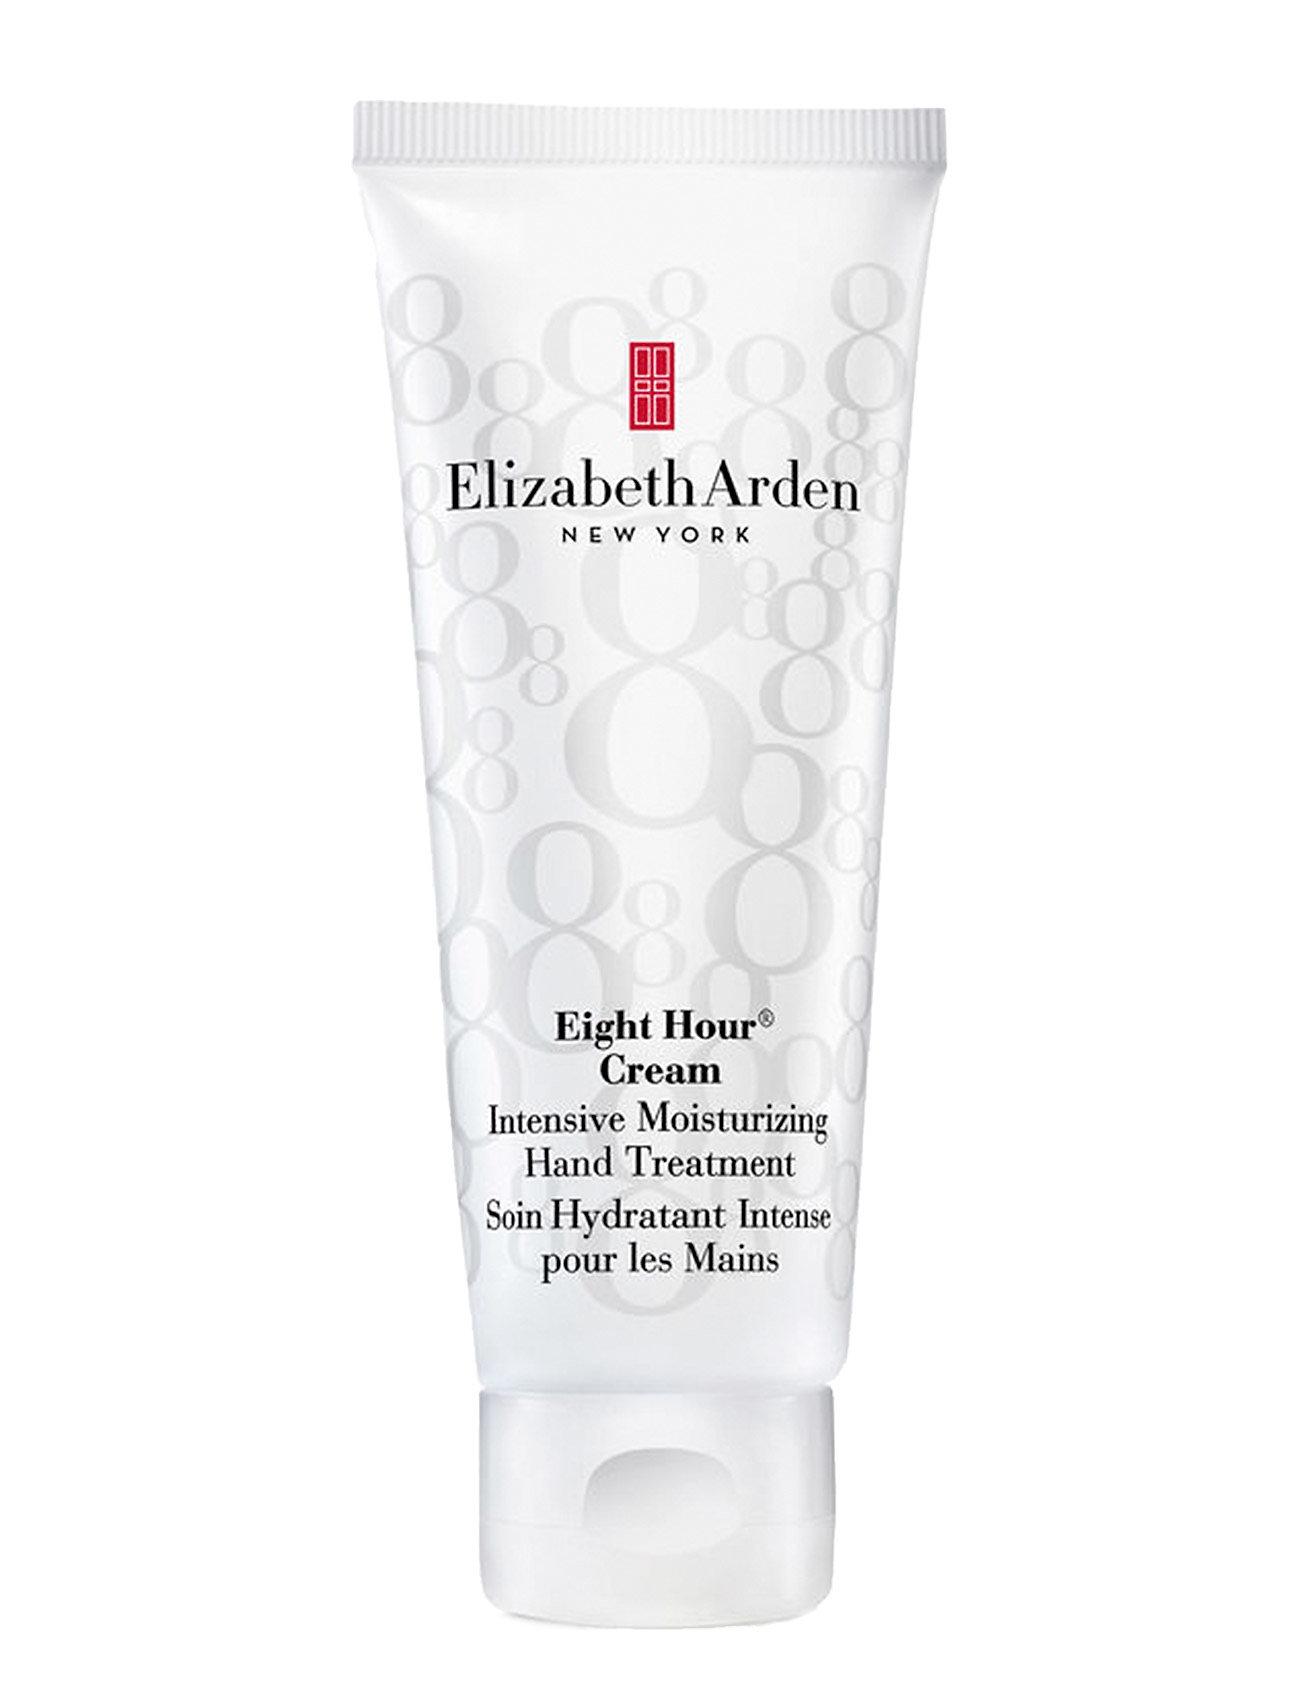 Image of Eight Hour Cream Moisturizing Hand Treatment Beauty WOMEN Skin Care Body Hand Cream & Foot Cream Nude Elizabeth Arden (3341919105)